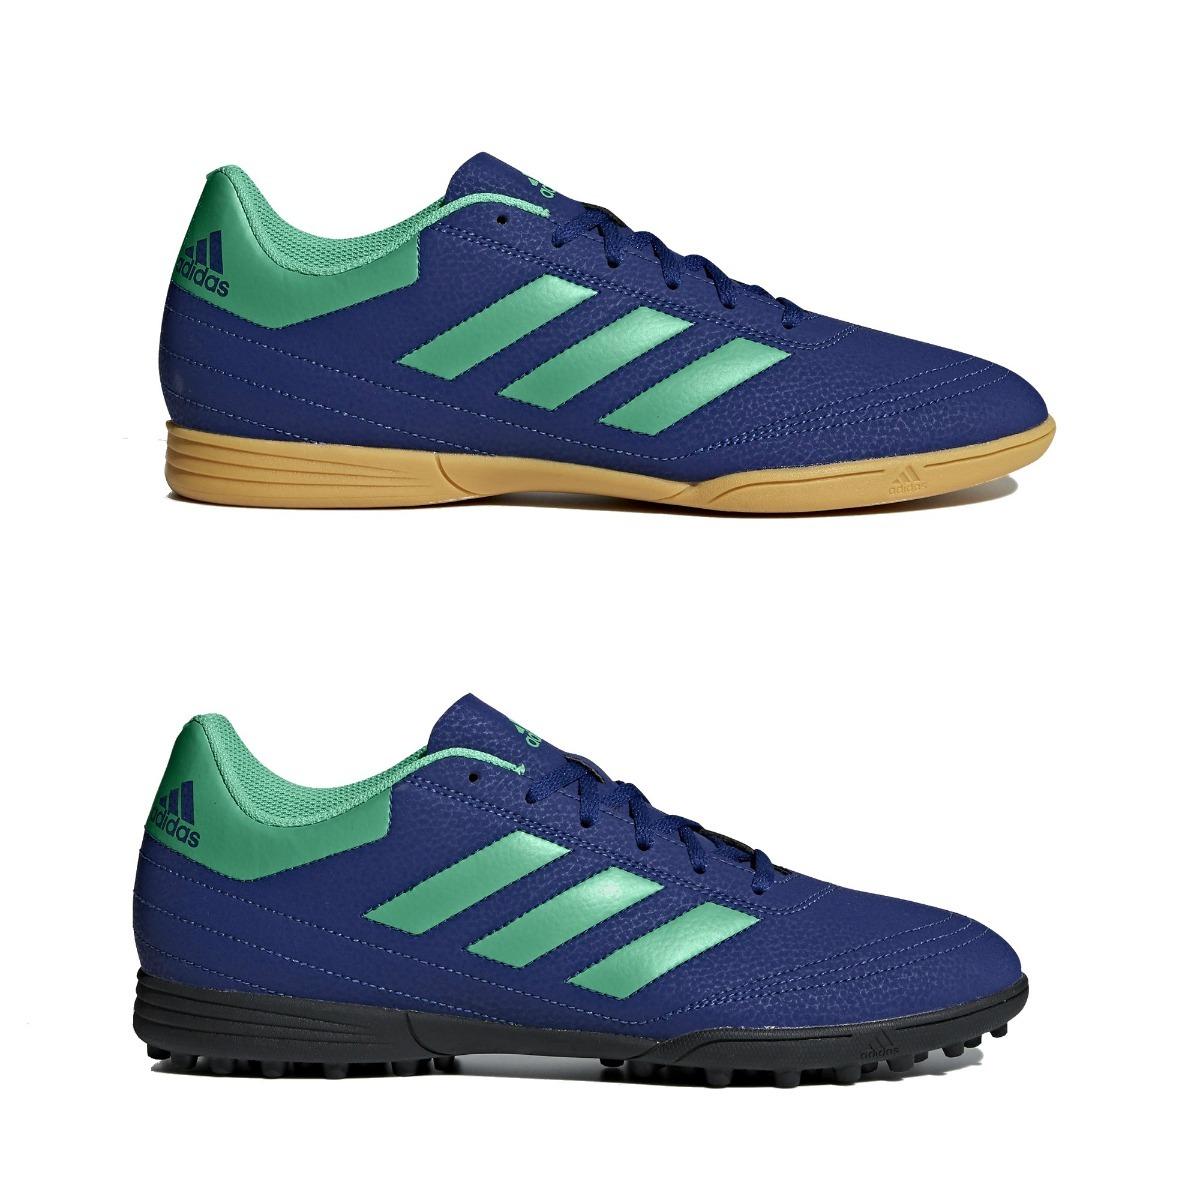 ee568aae155 Zapatillas Hombre adidas Goletto Vi Grass Sintetico Futsal - S/ 159 ...